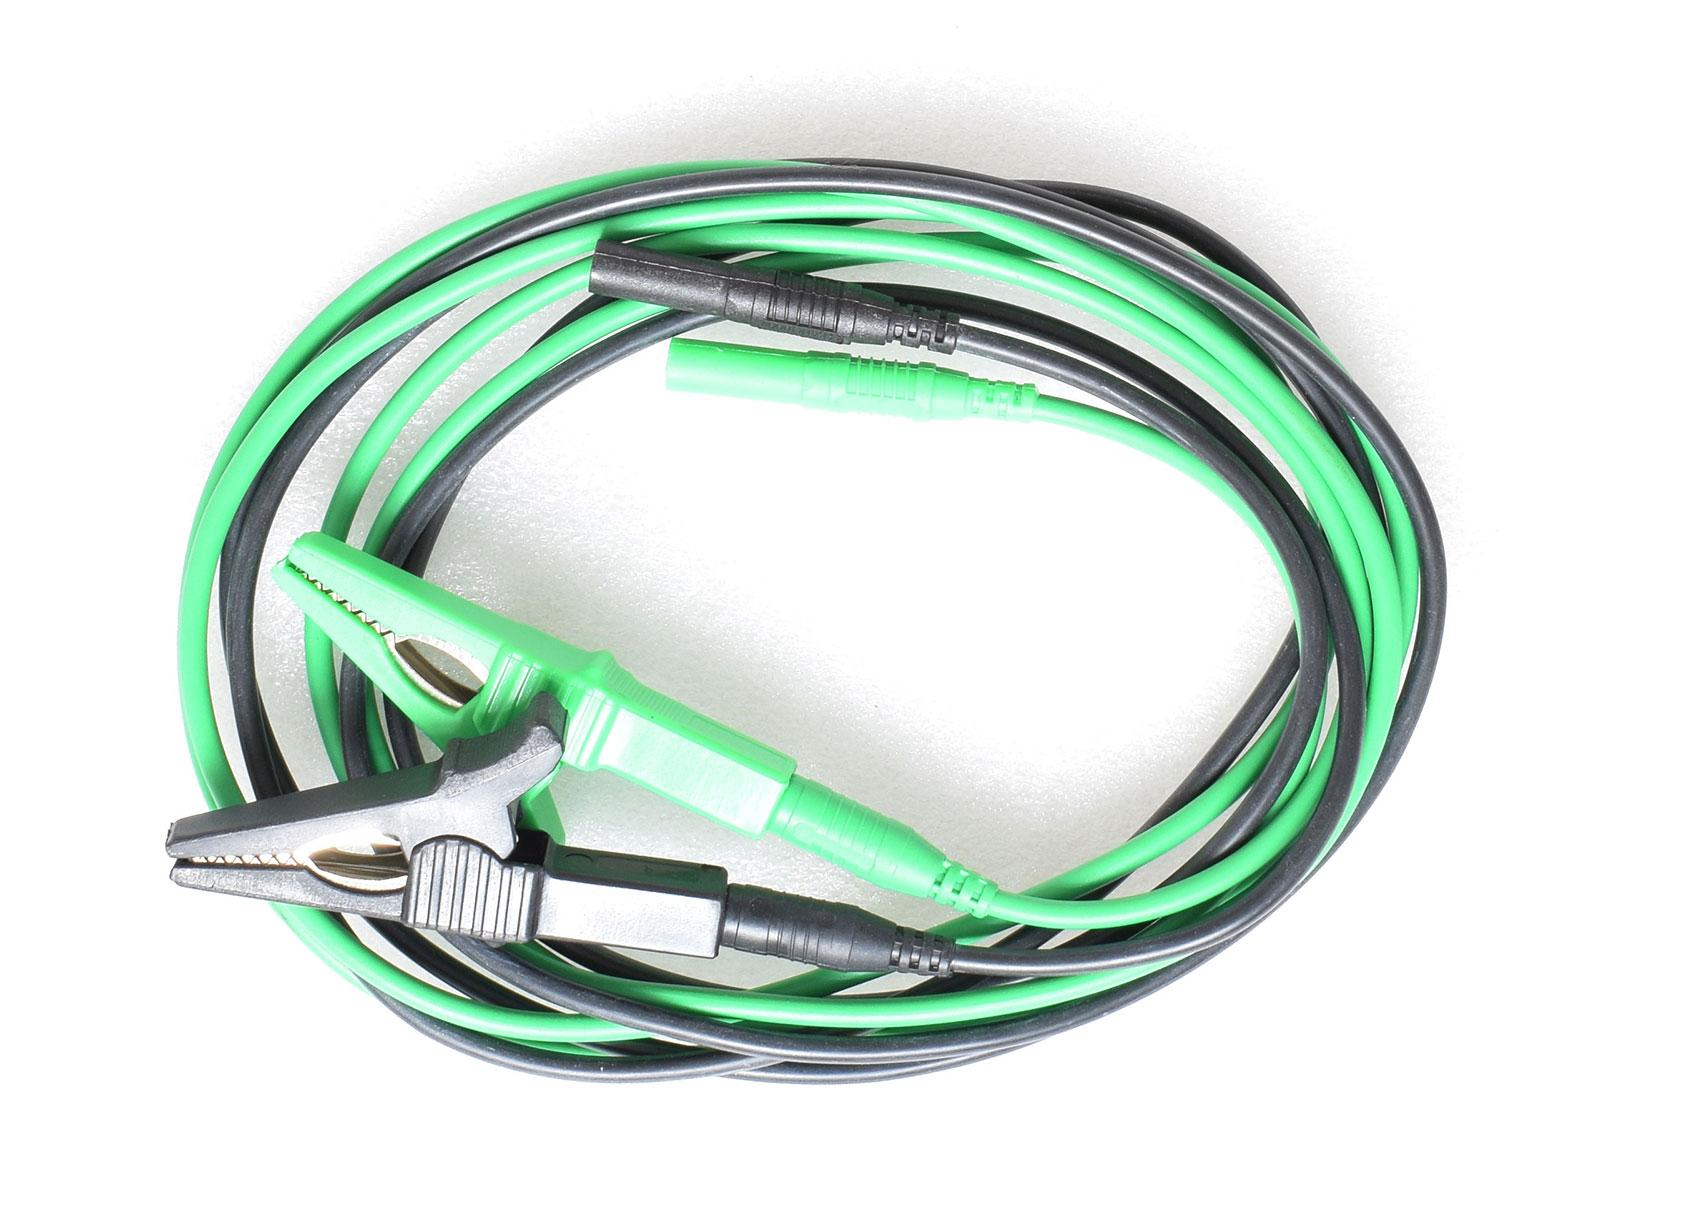 YTC2010智能双显绝缘电阻测试仪连接线2